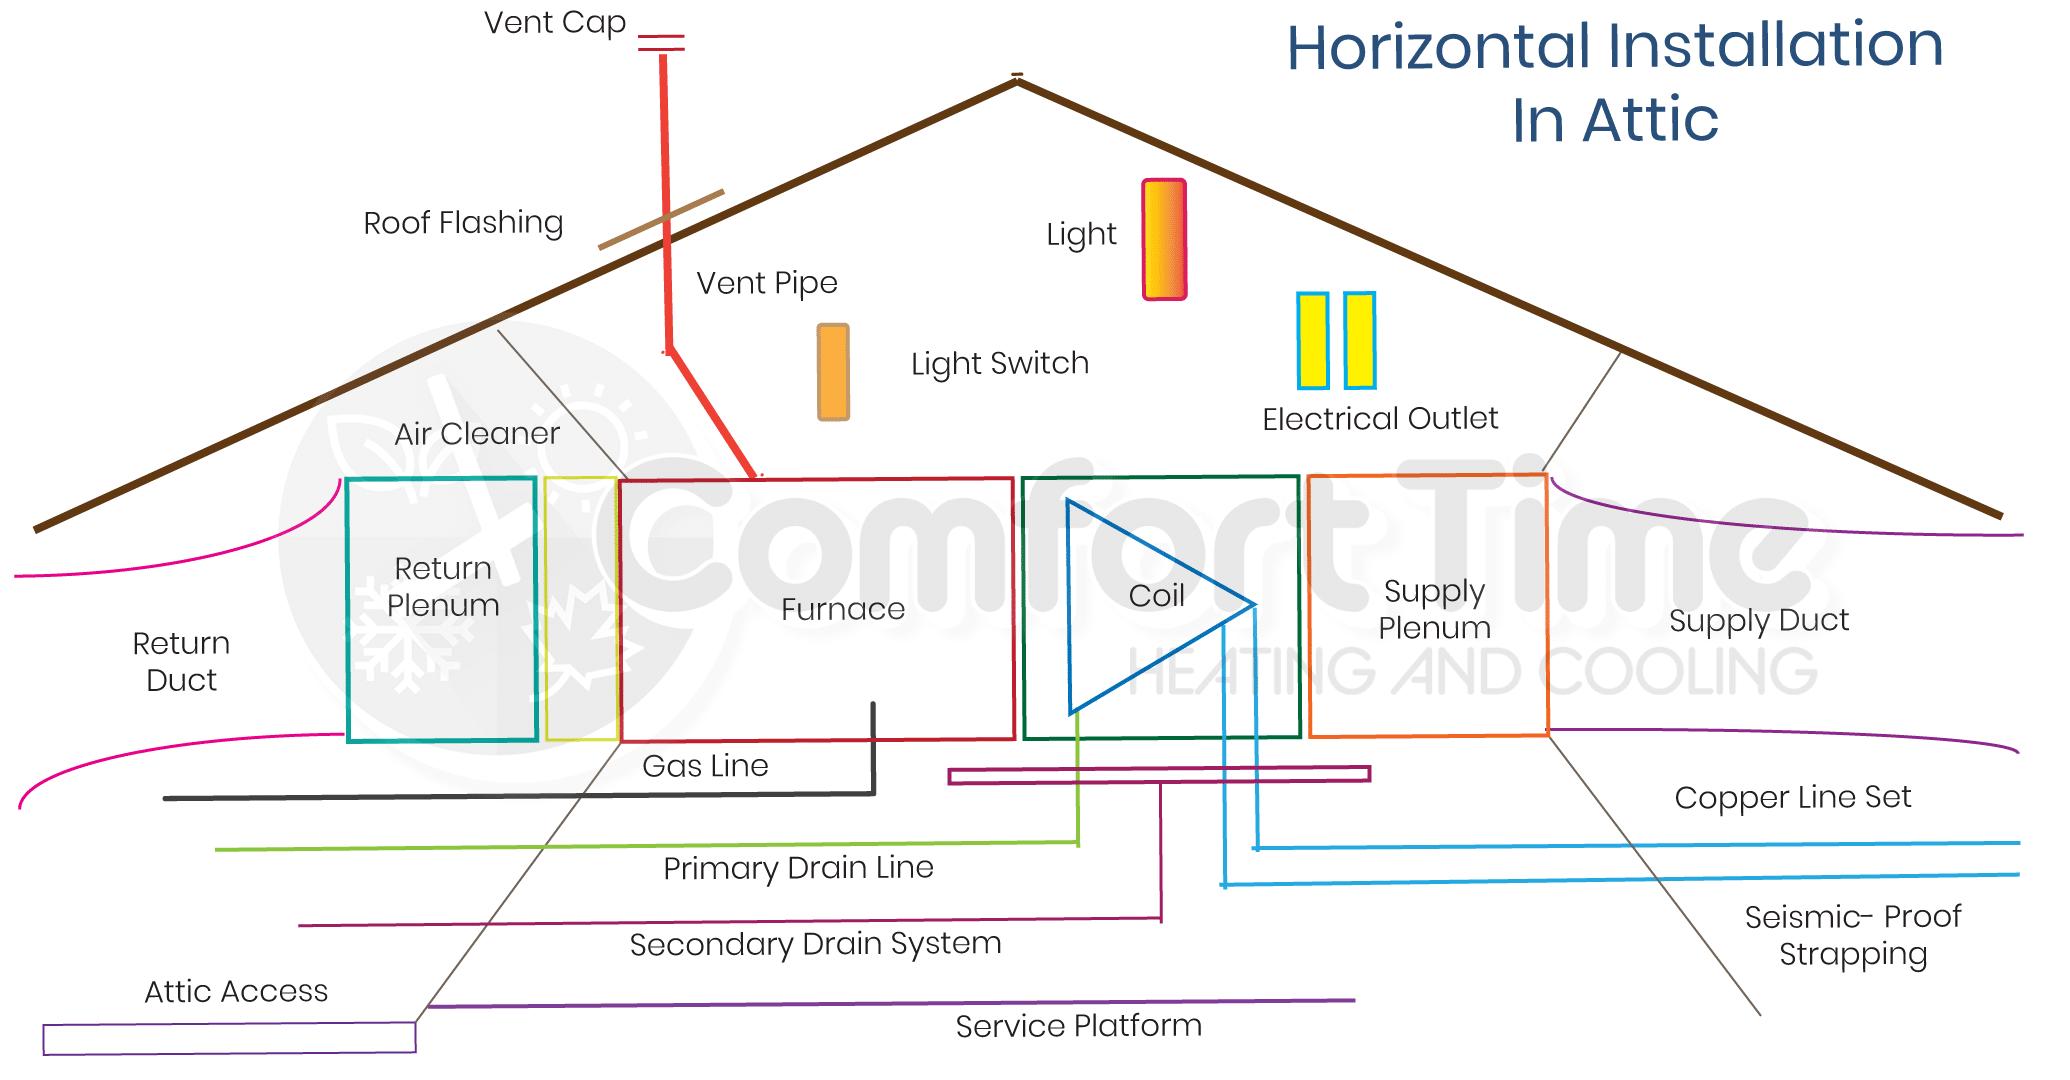 Horizontal attic installation diagram